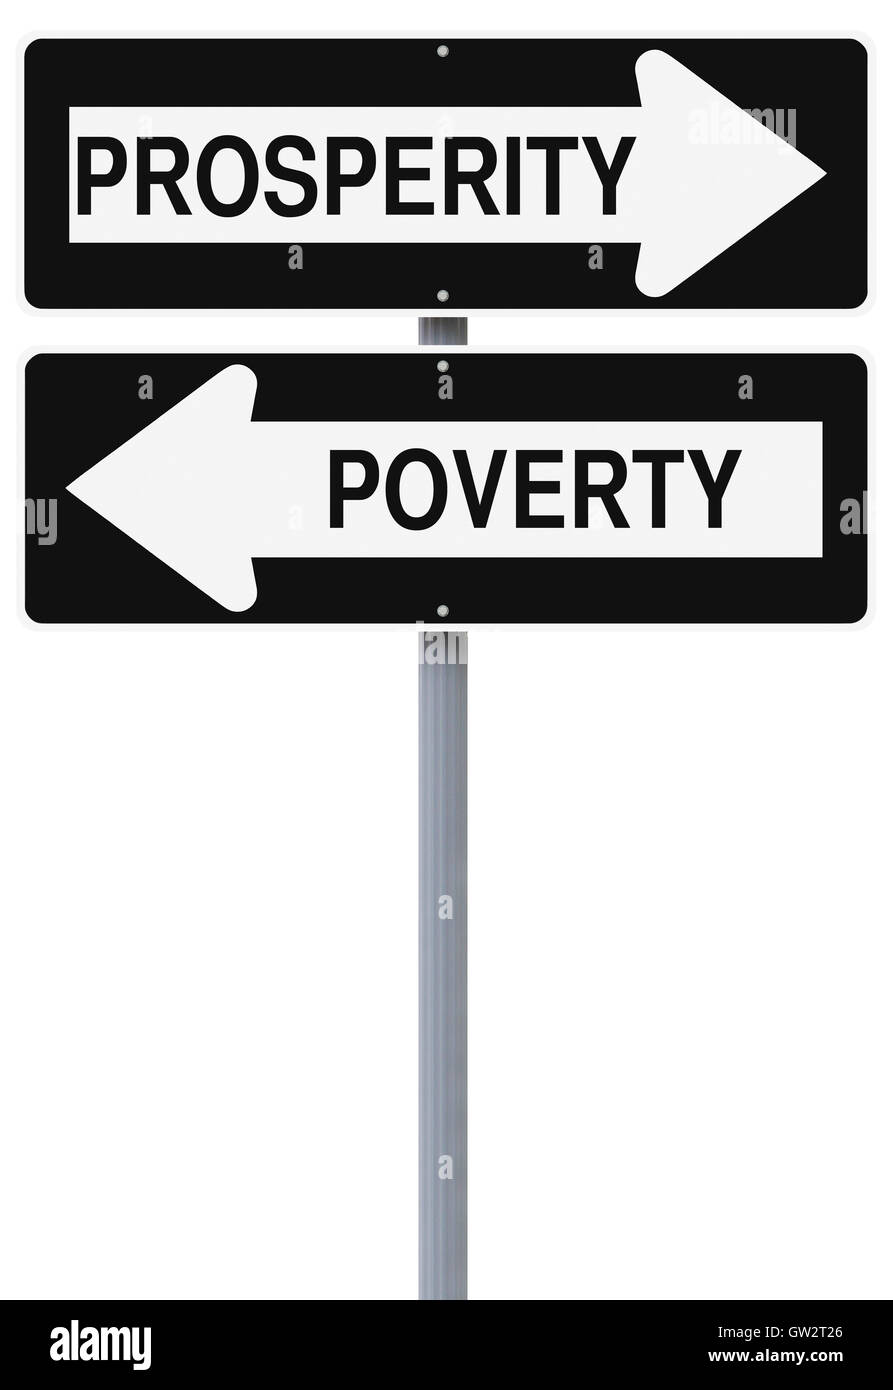 Prosperity or Poverty - Stock Image